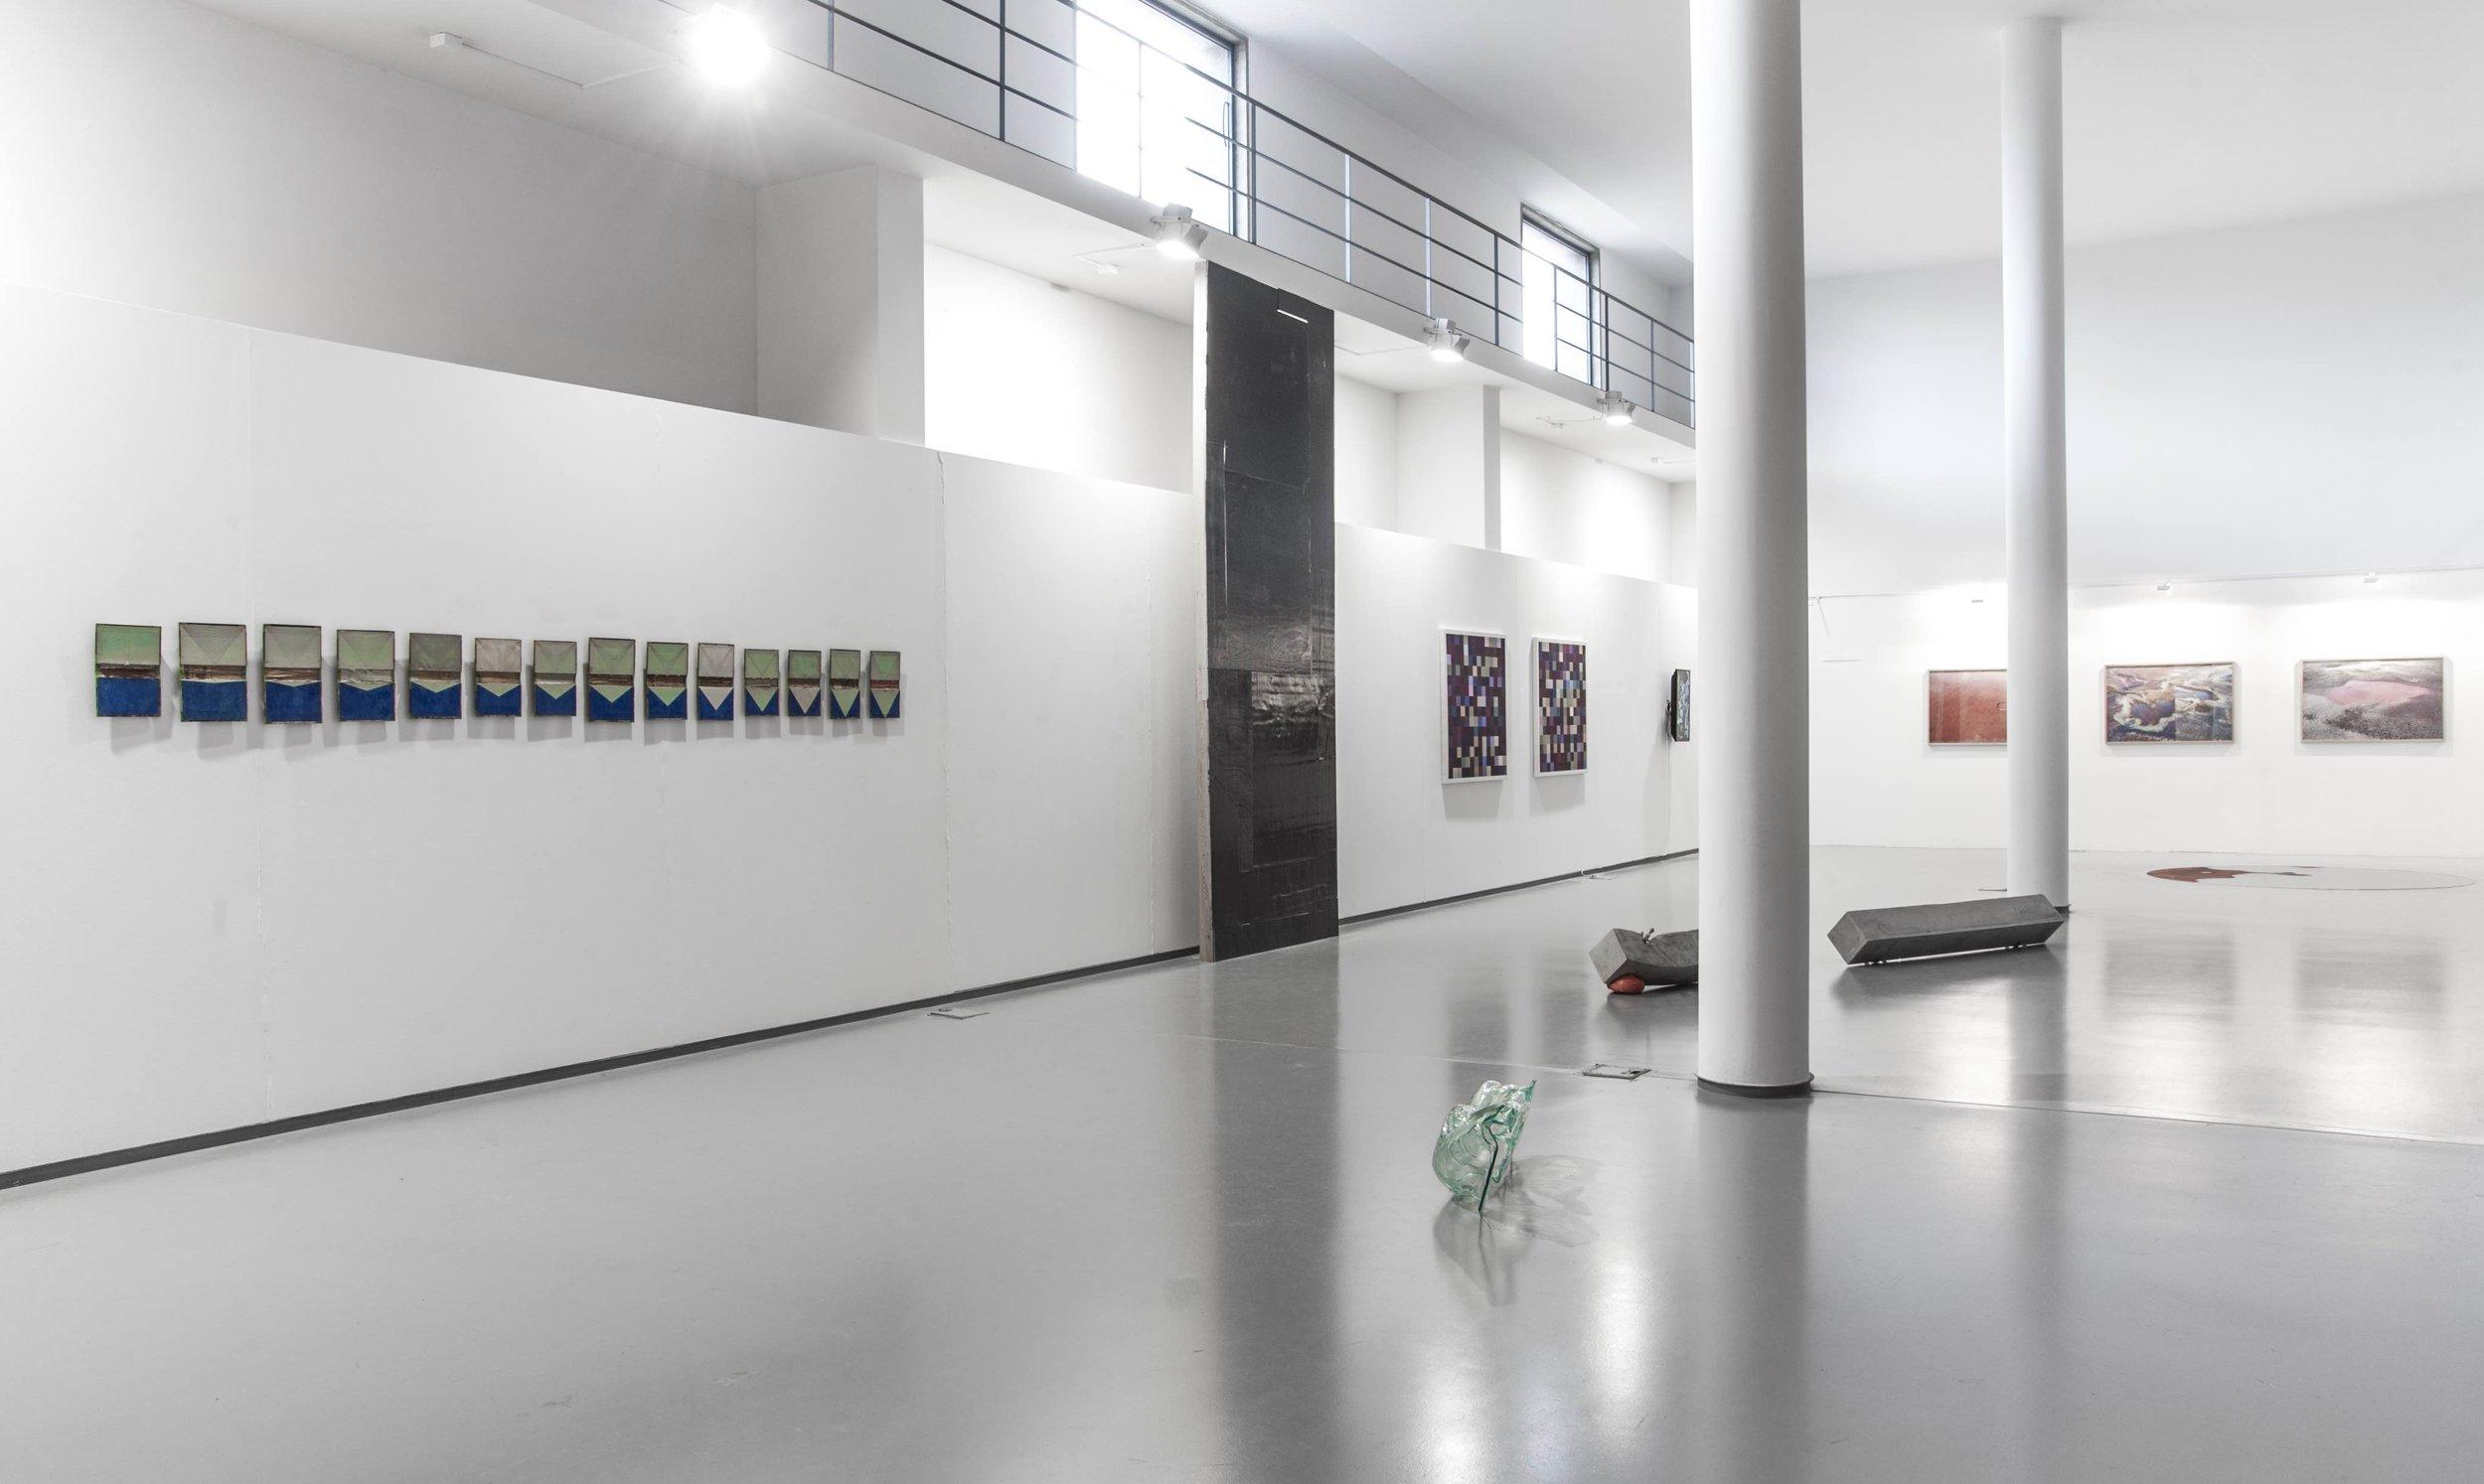 1 PADA-exhibition-2019-03-capituloI-image-by-mia-dudek-109.jpg